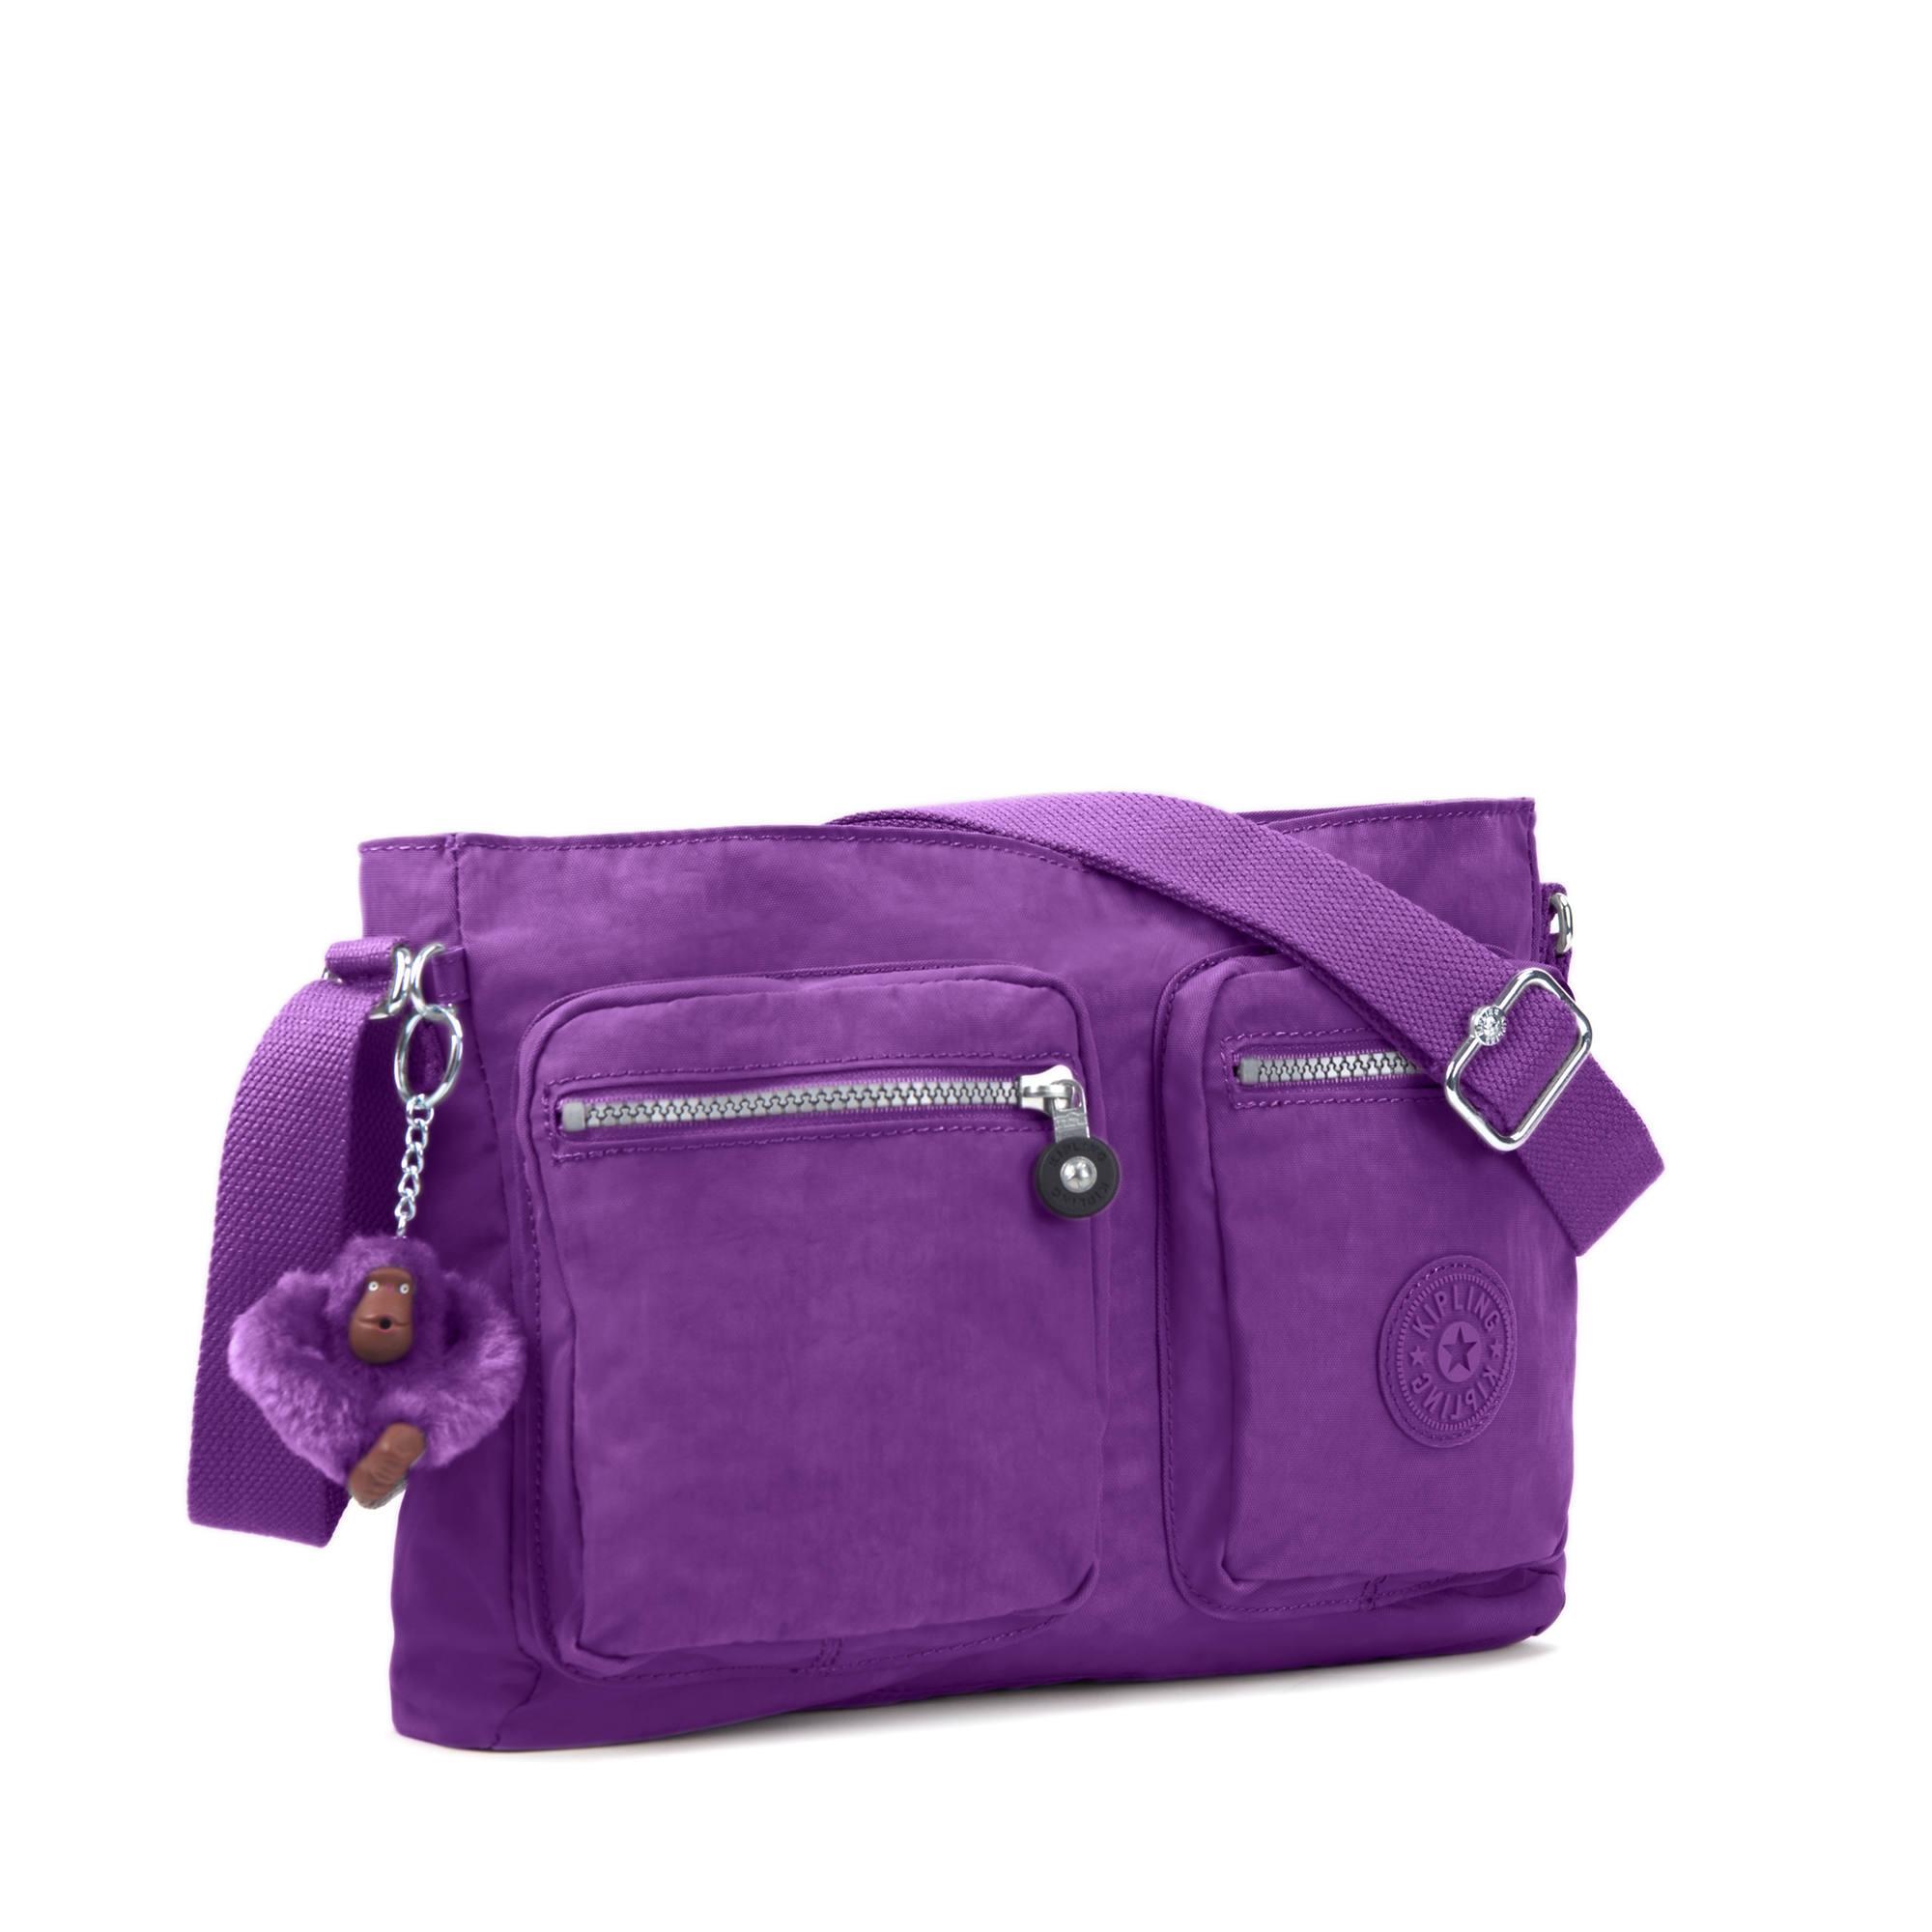 Many Pocket Big Crossbody Bags For Women 2018,PURPLE,Russian Federation